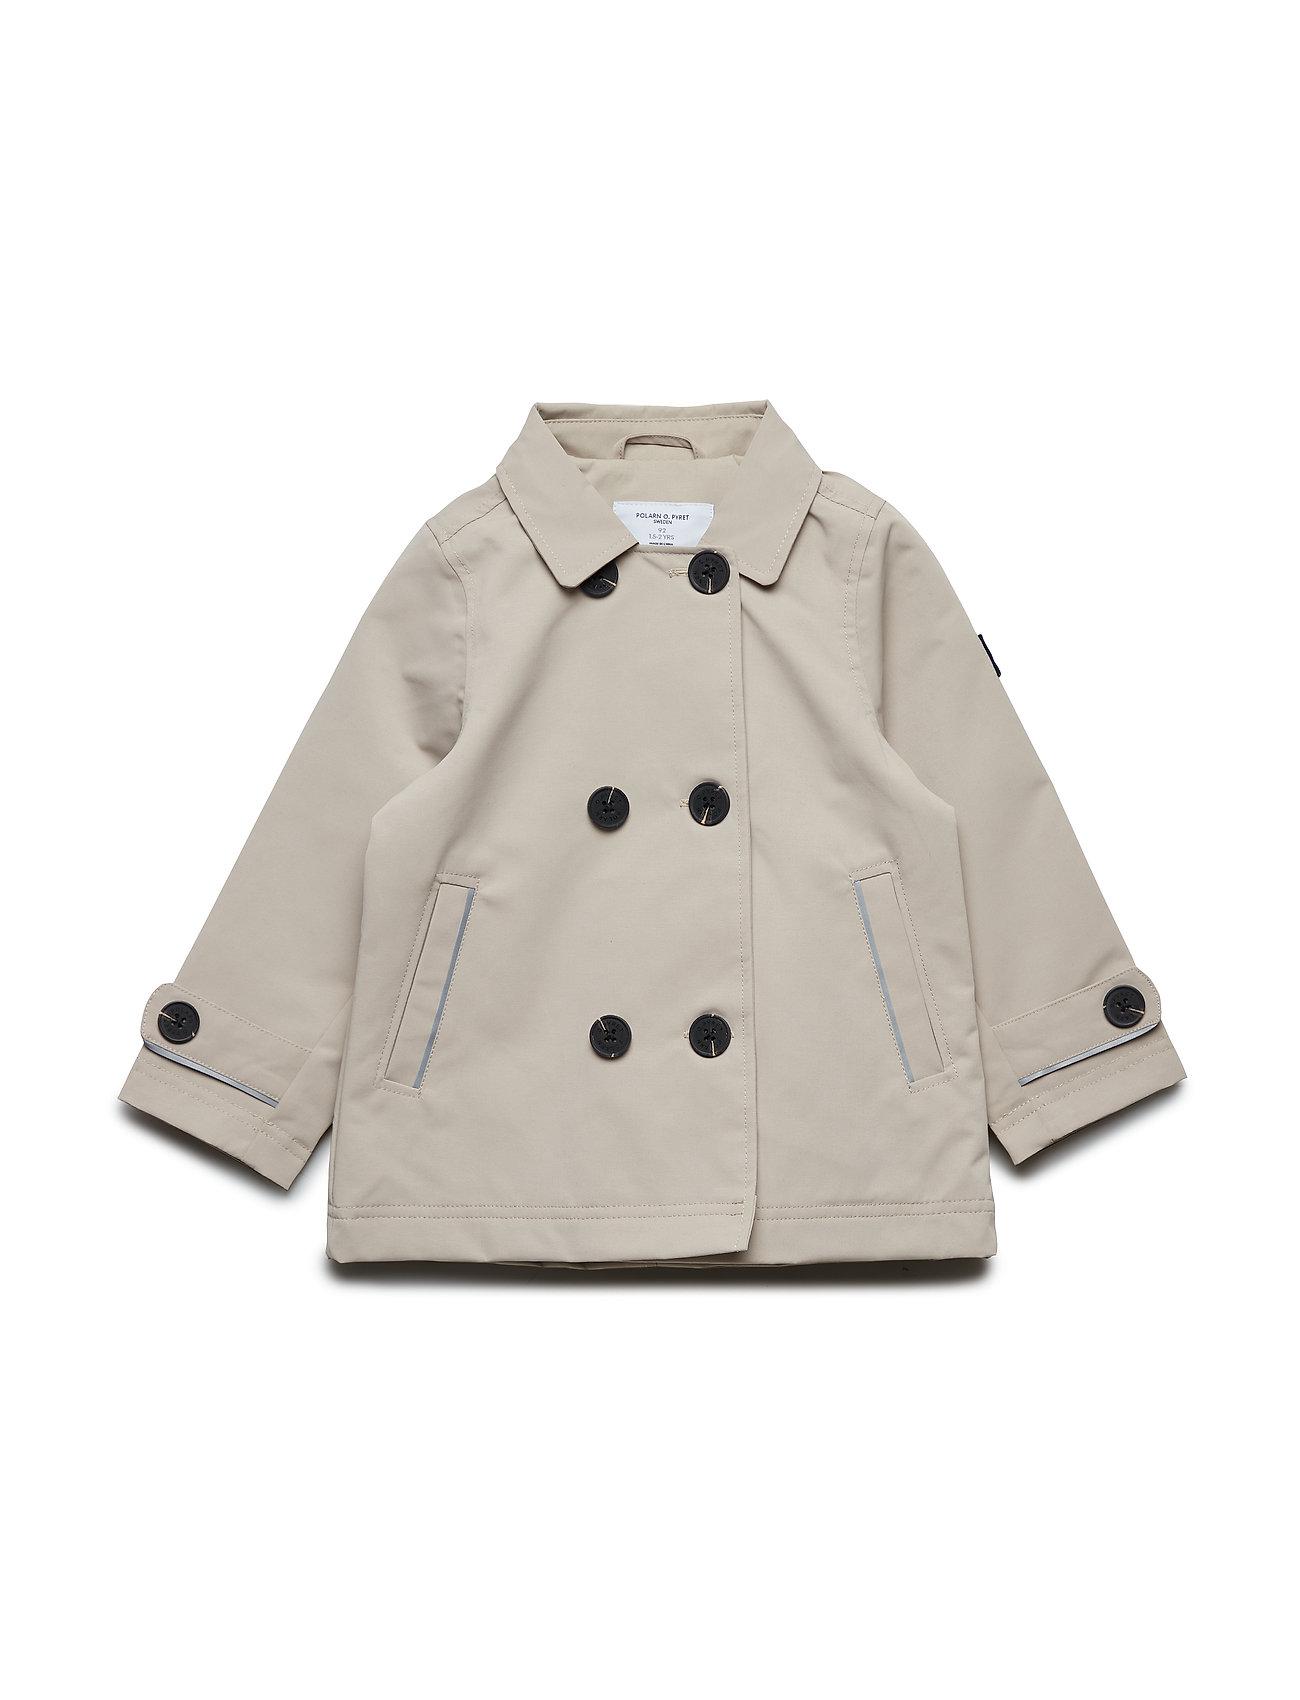 Polarn O. Pyret Trench Coat